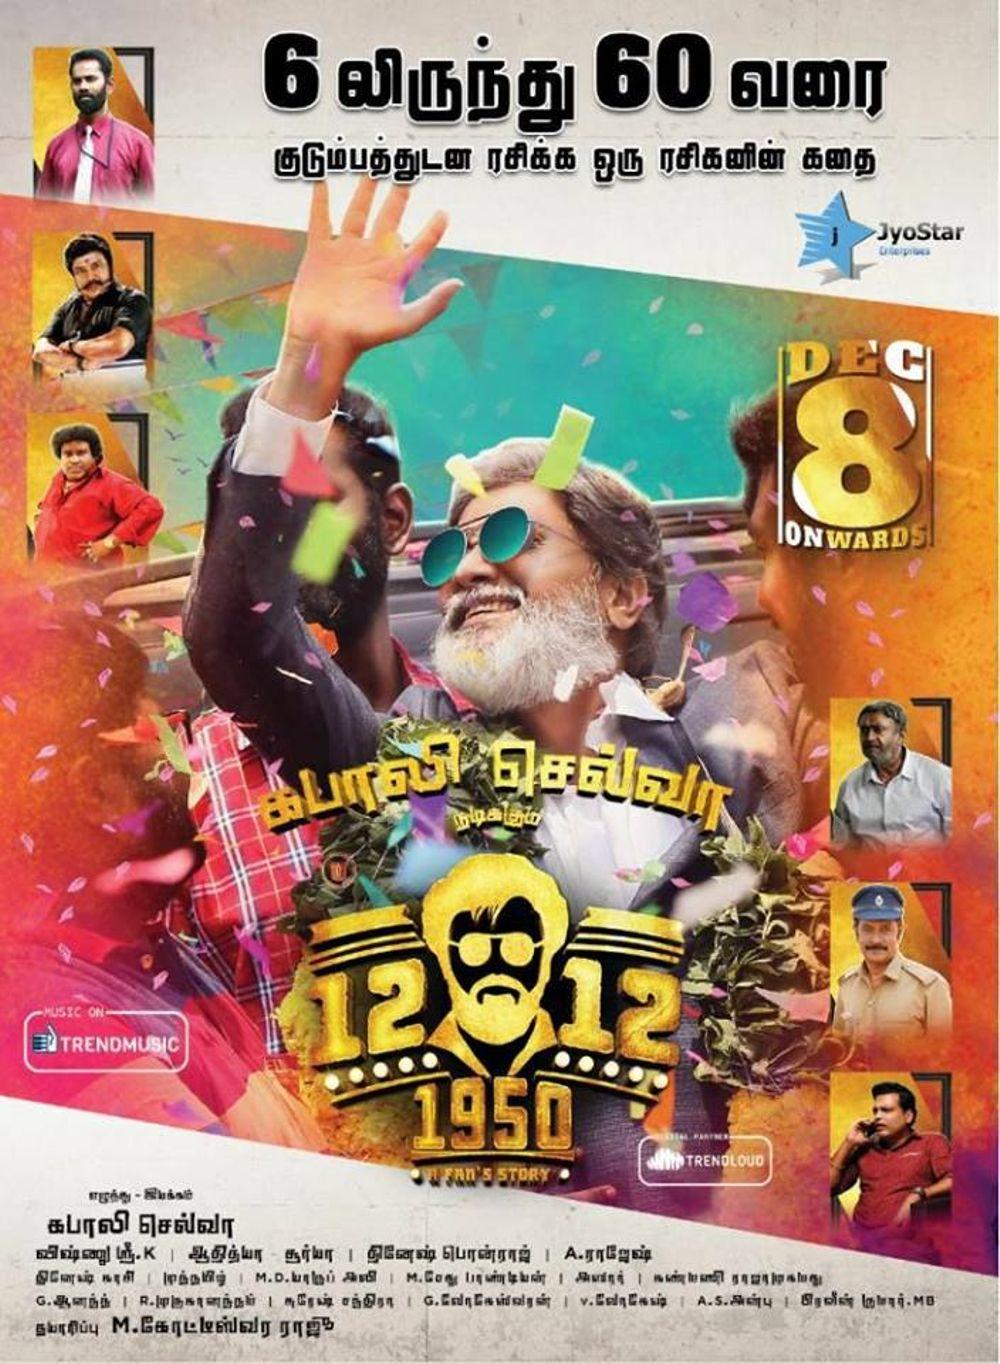 12-12-1950 Movie Review Tamil Movie Review